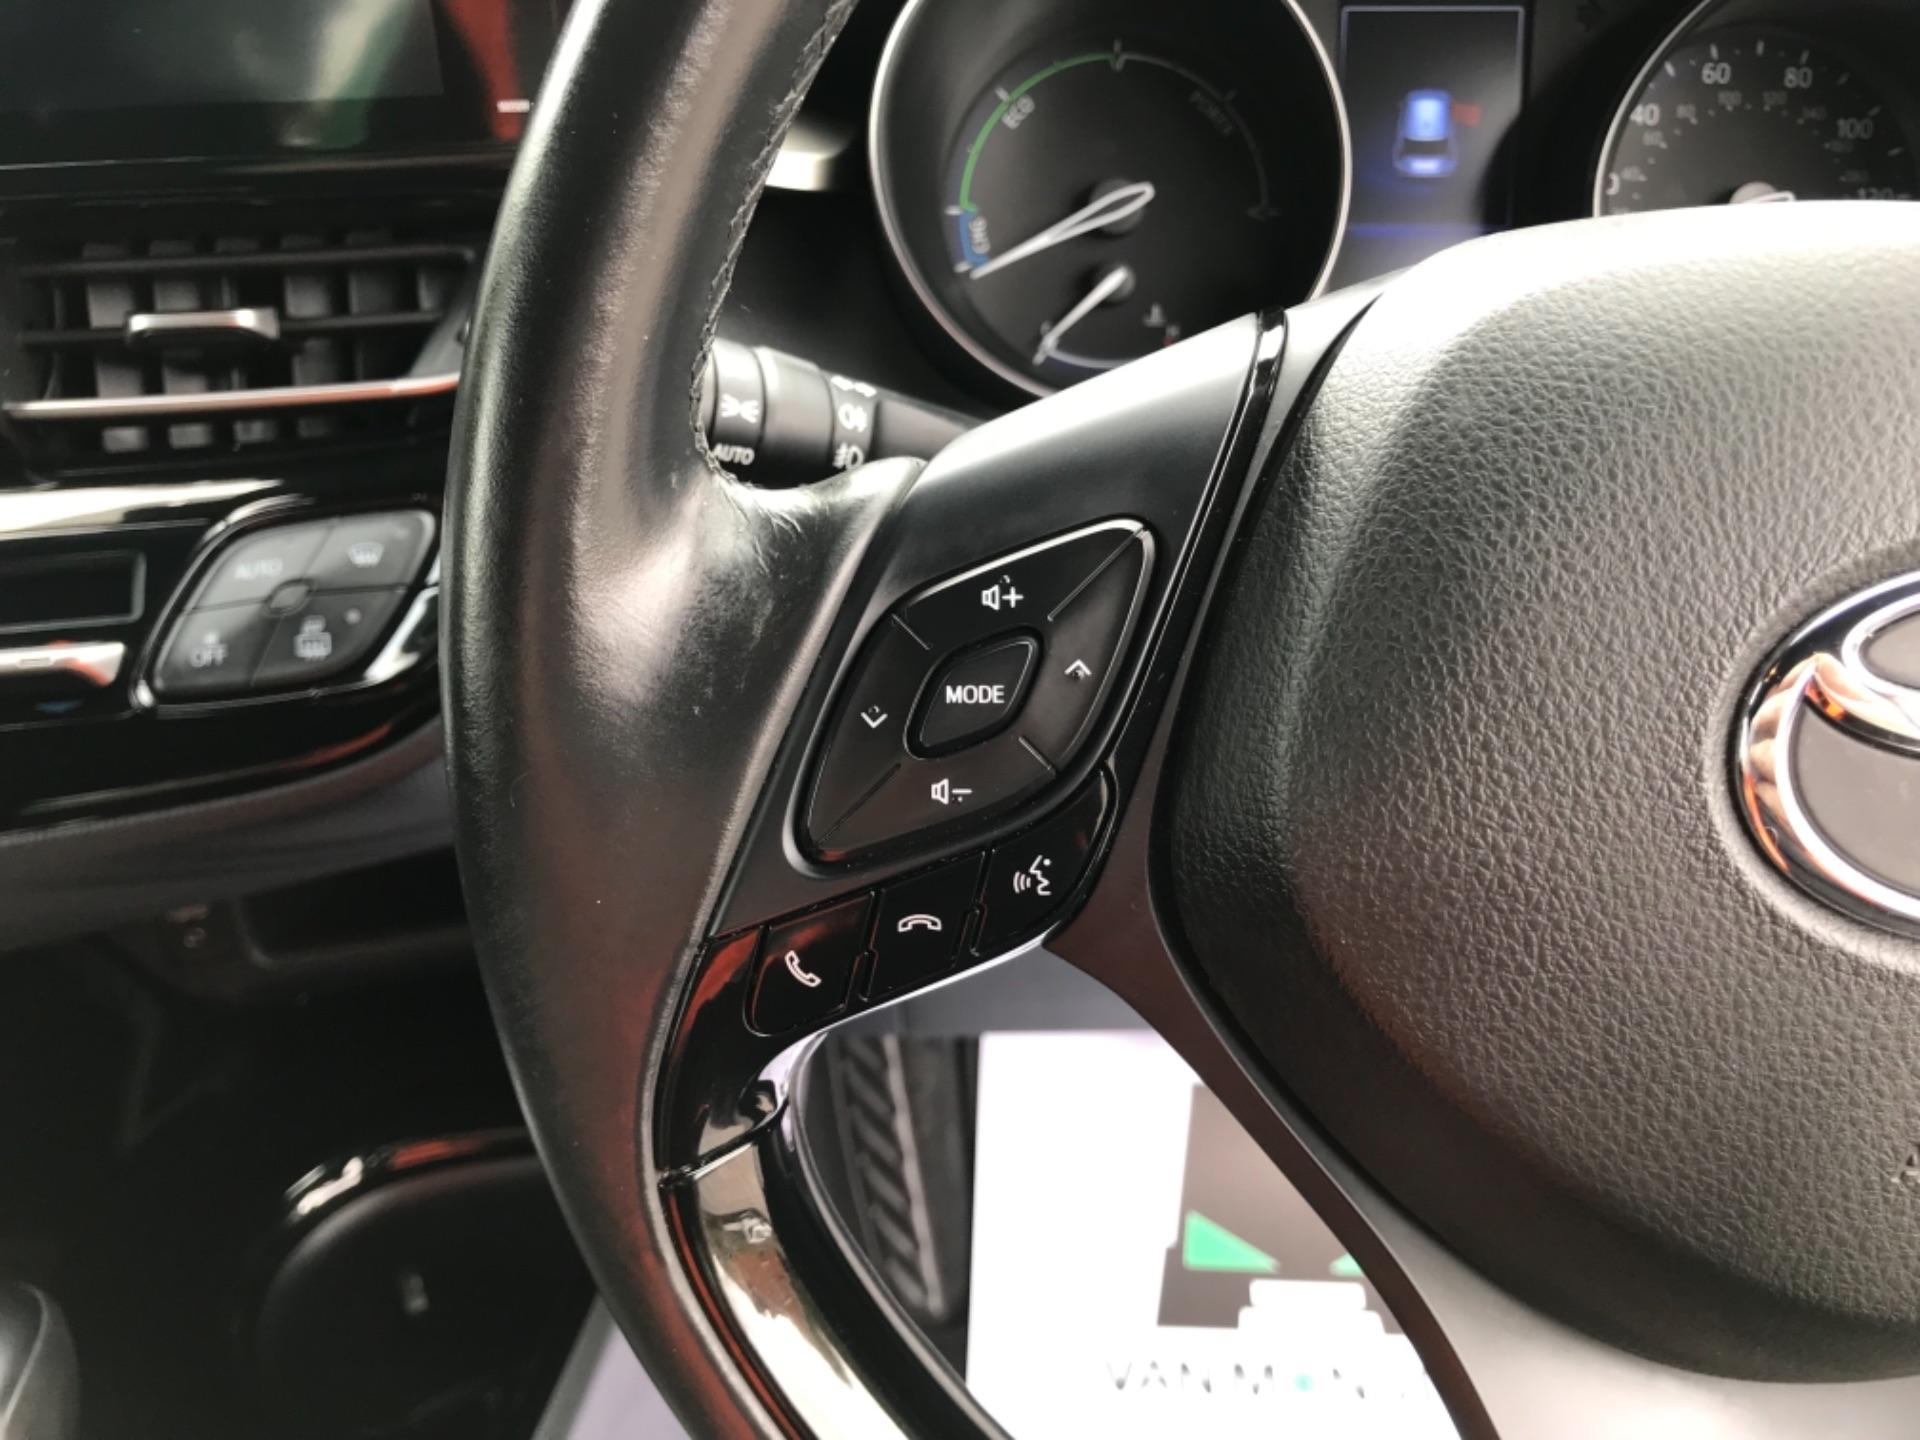 2018 Toyota C-Hr 1.8 Hybrid Dynamic 5Dr Cvt (NV18NVX) Image 17